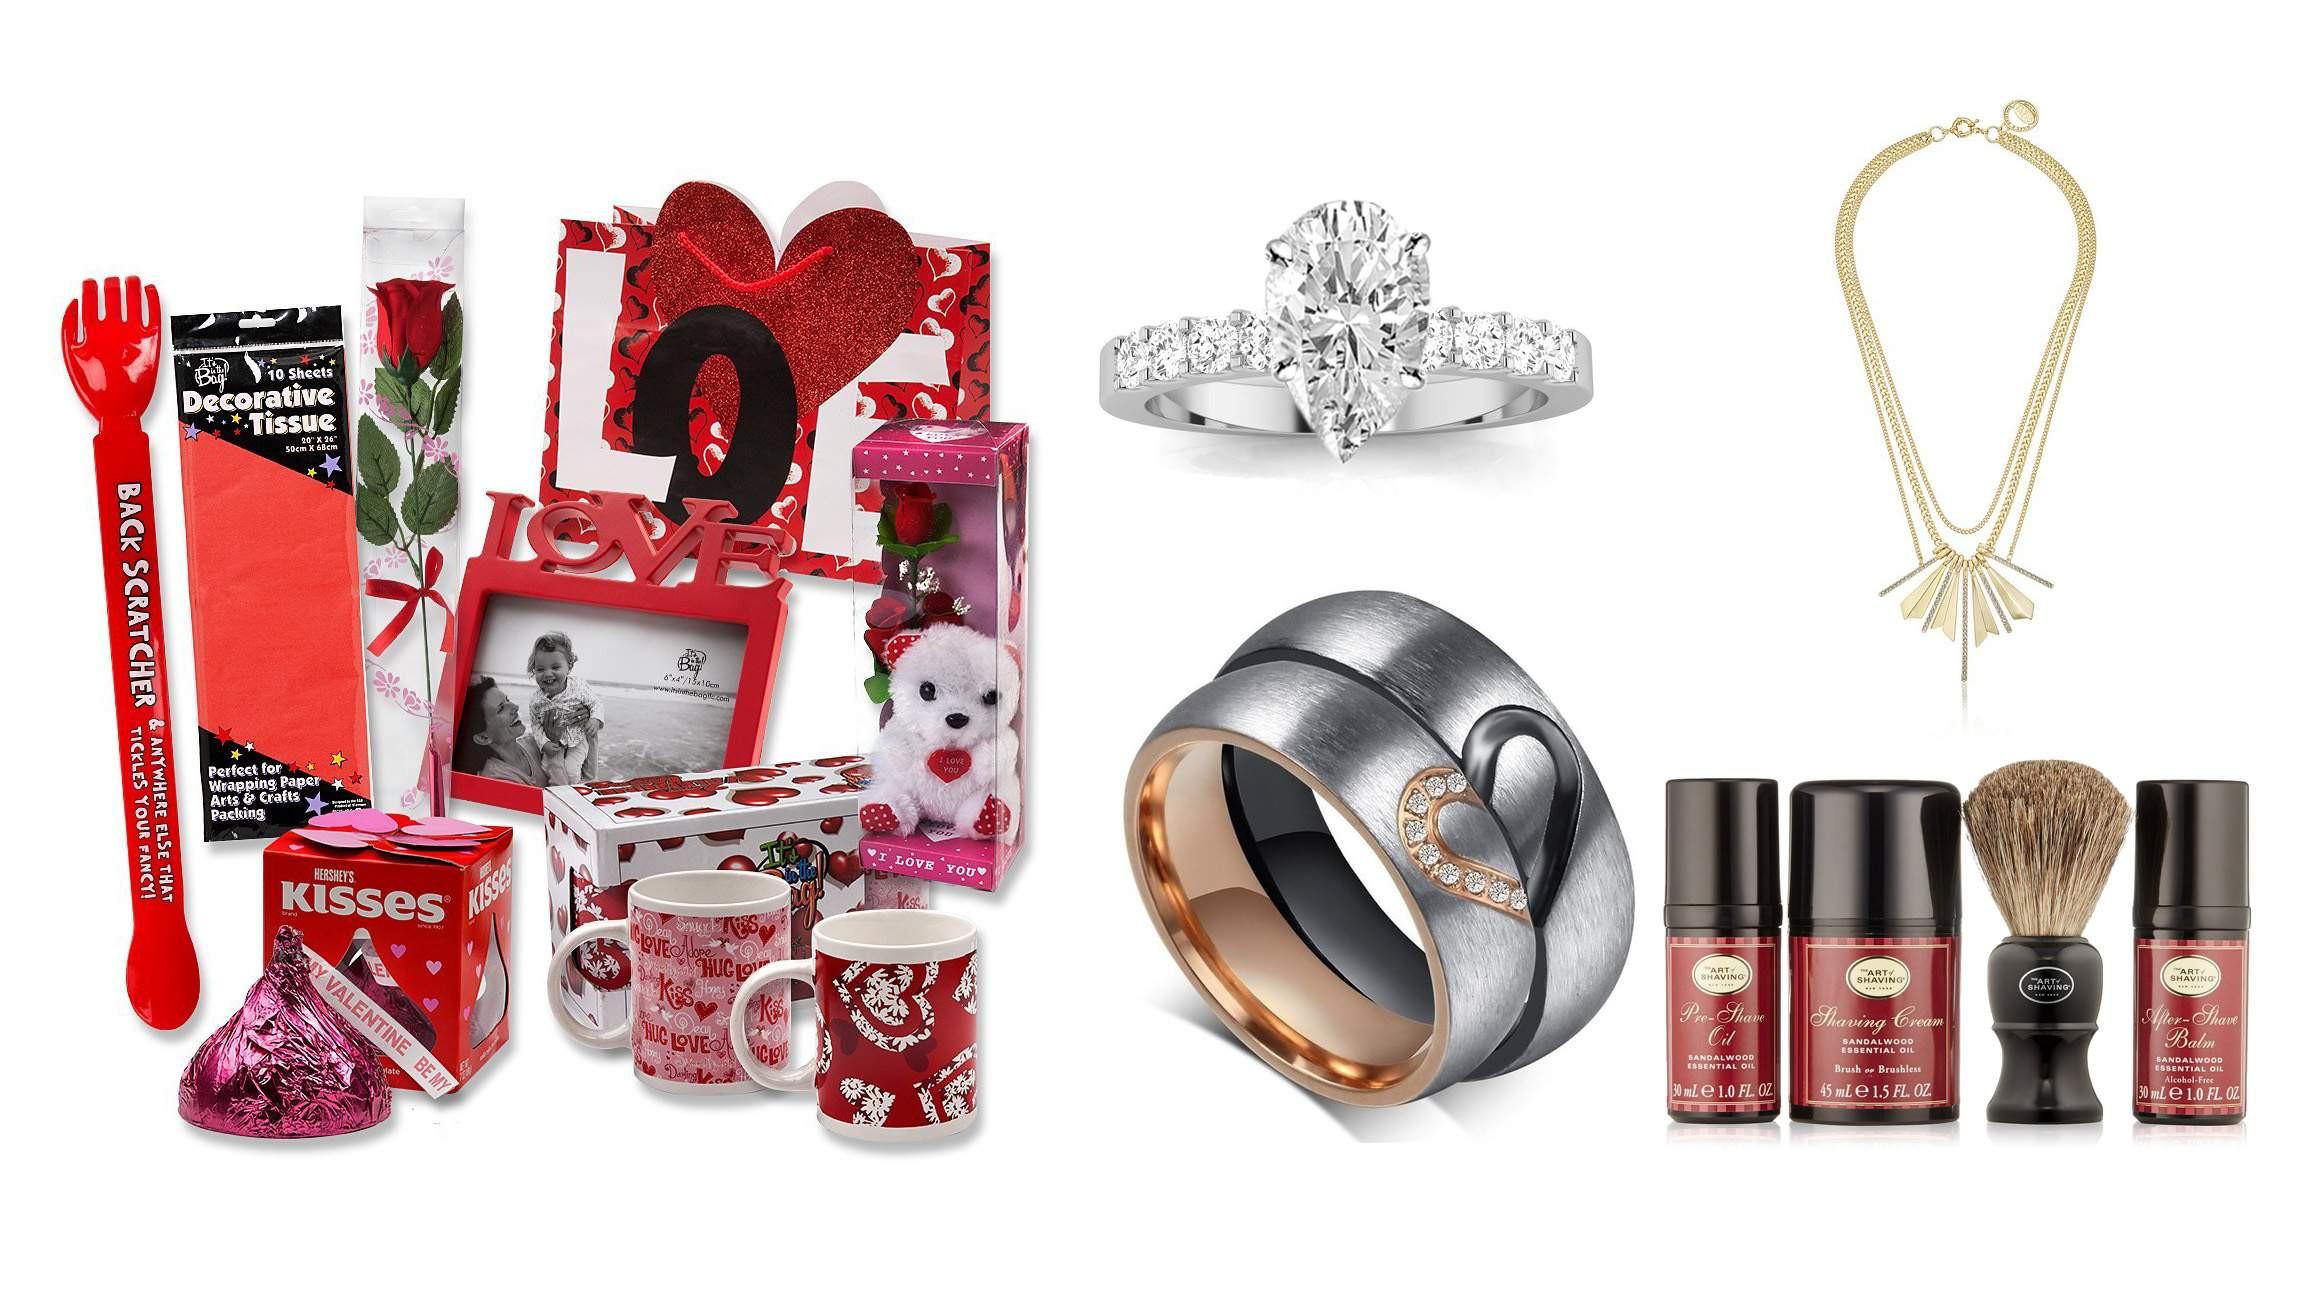 Best Guy Valentines Day Gift Ideas  Top 101 Best Valentine's Day Gifts The Heavy Power List